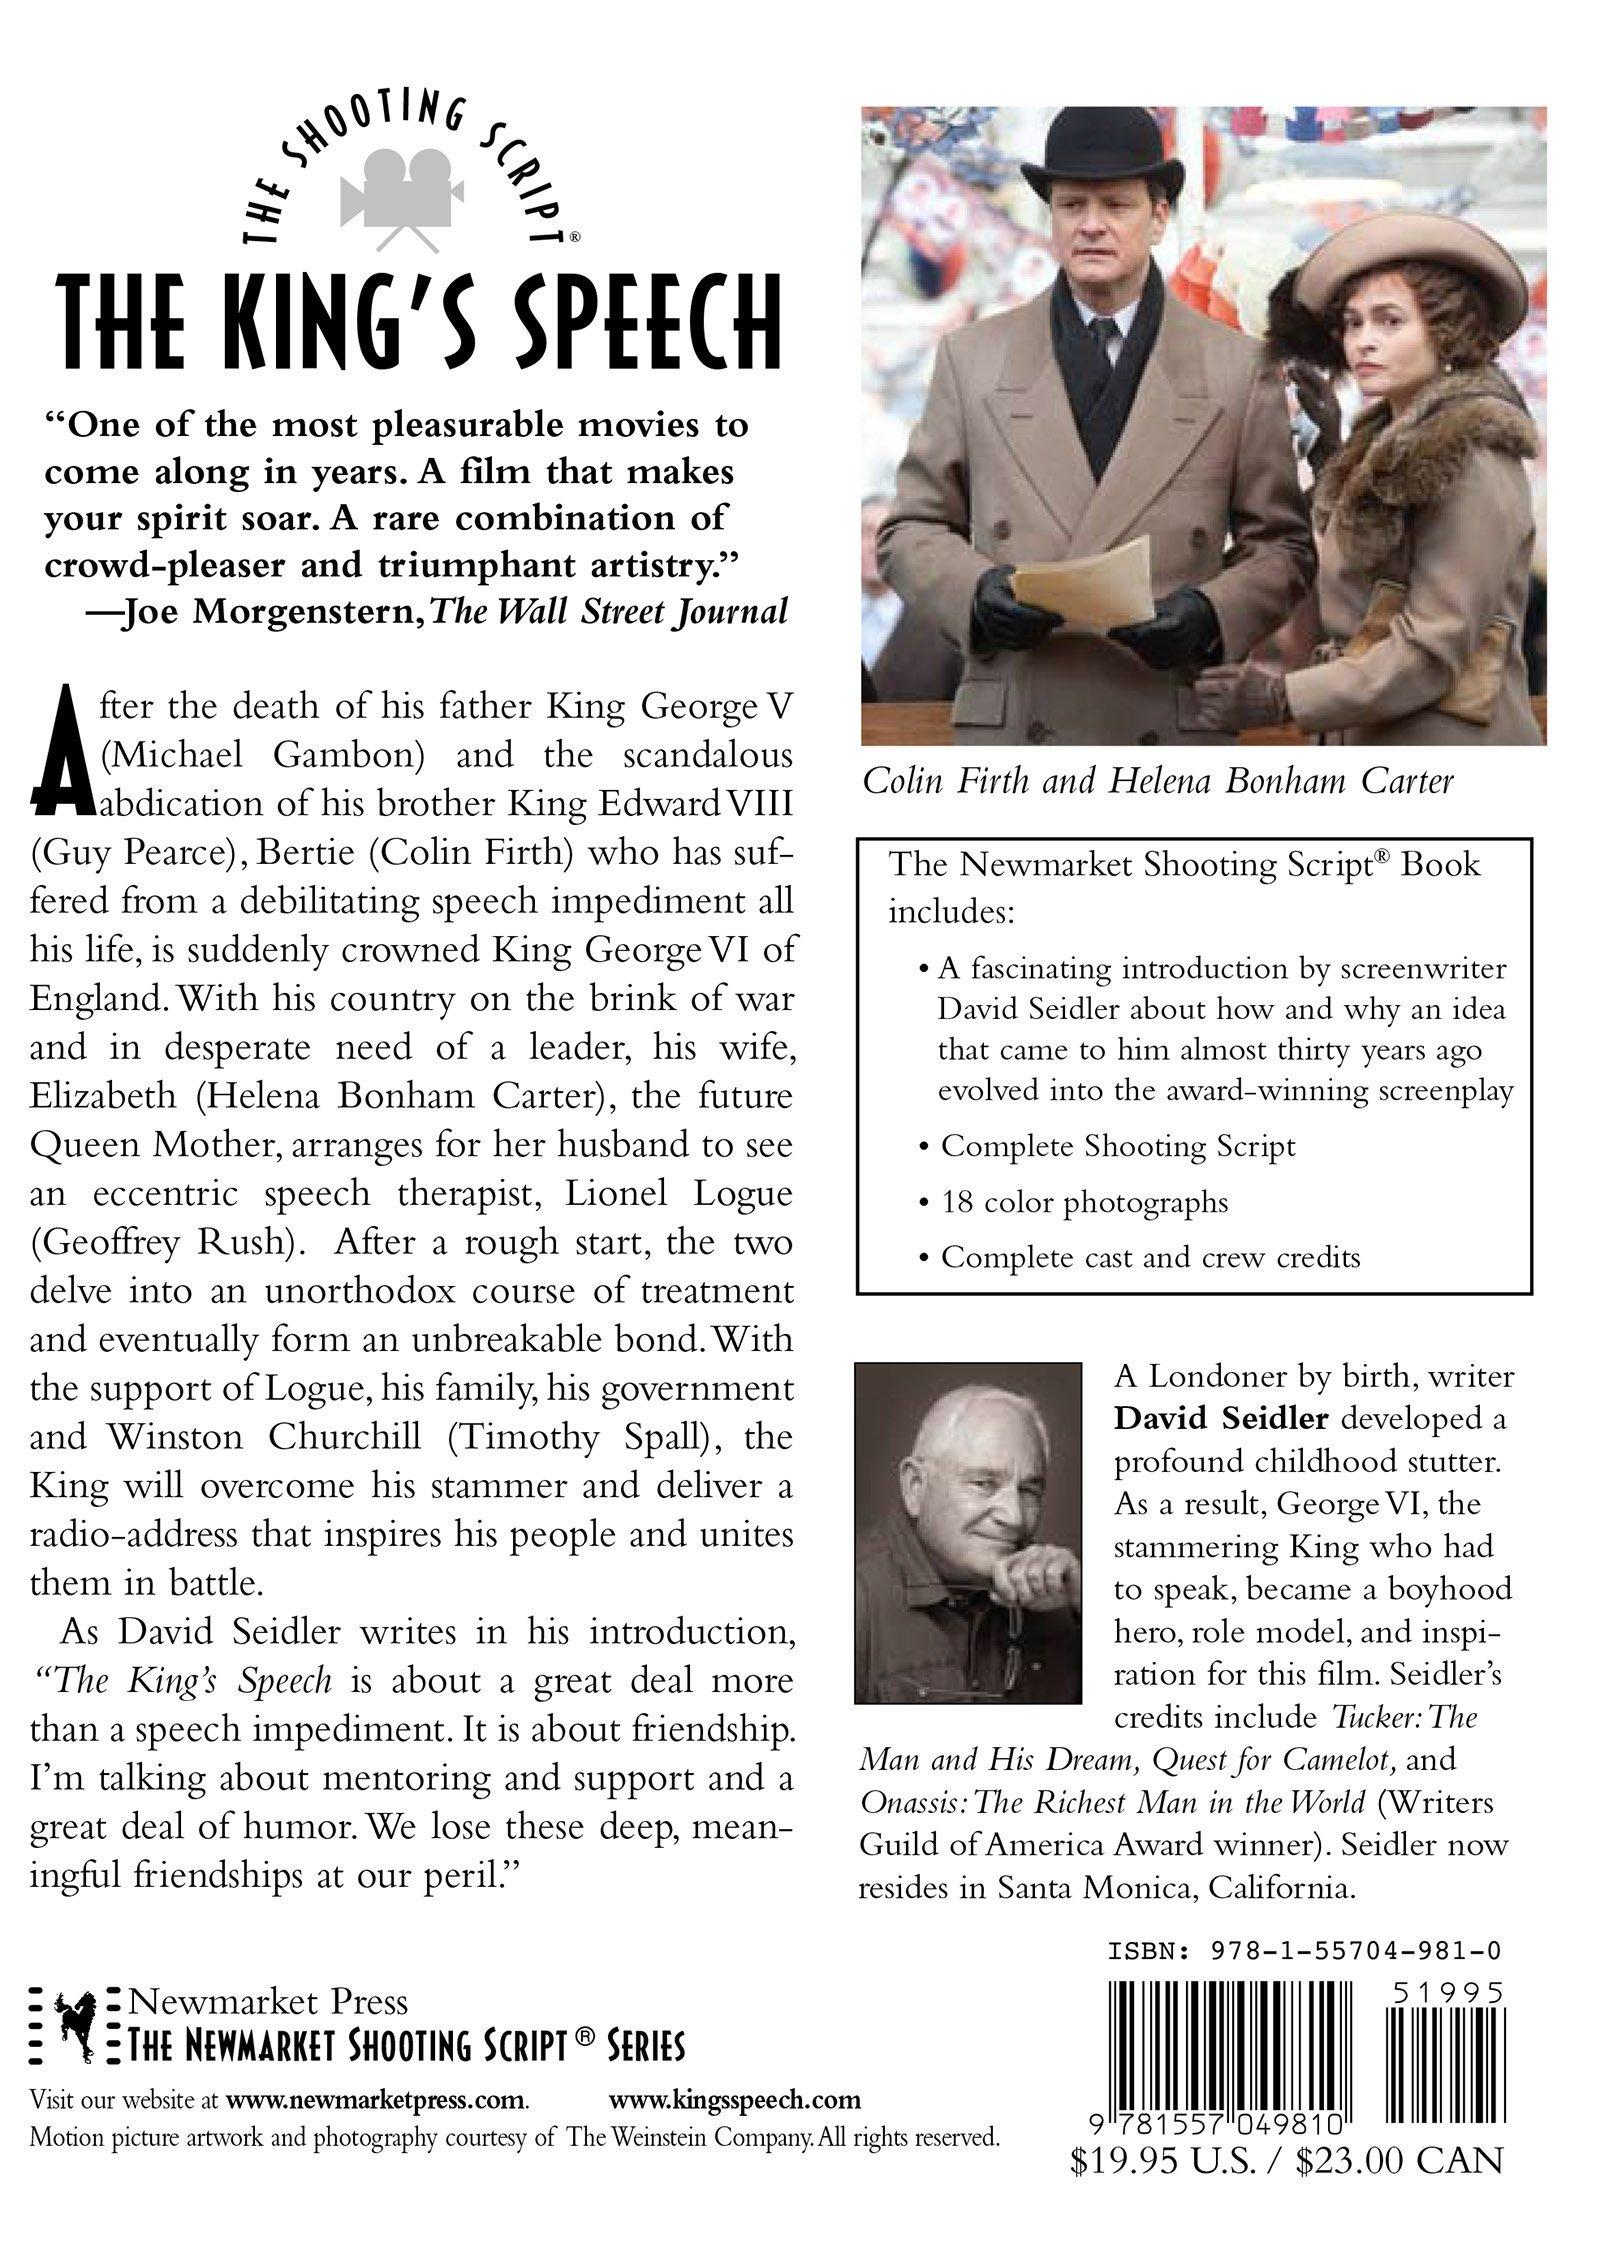 The King's Speech: The Shooting Script: David Seidler: 9781557049810:  Amazon.com: Books